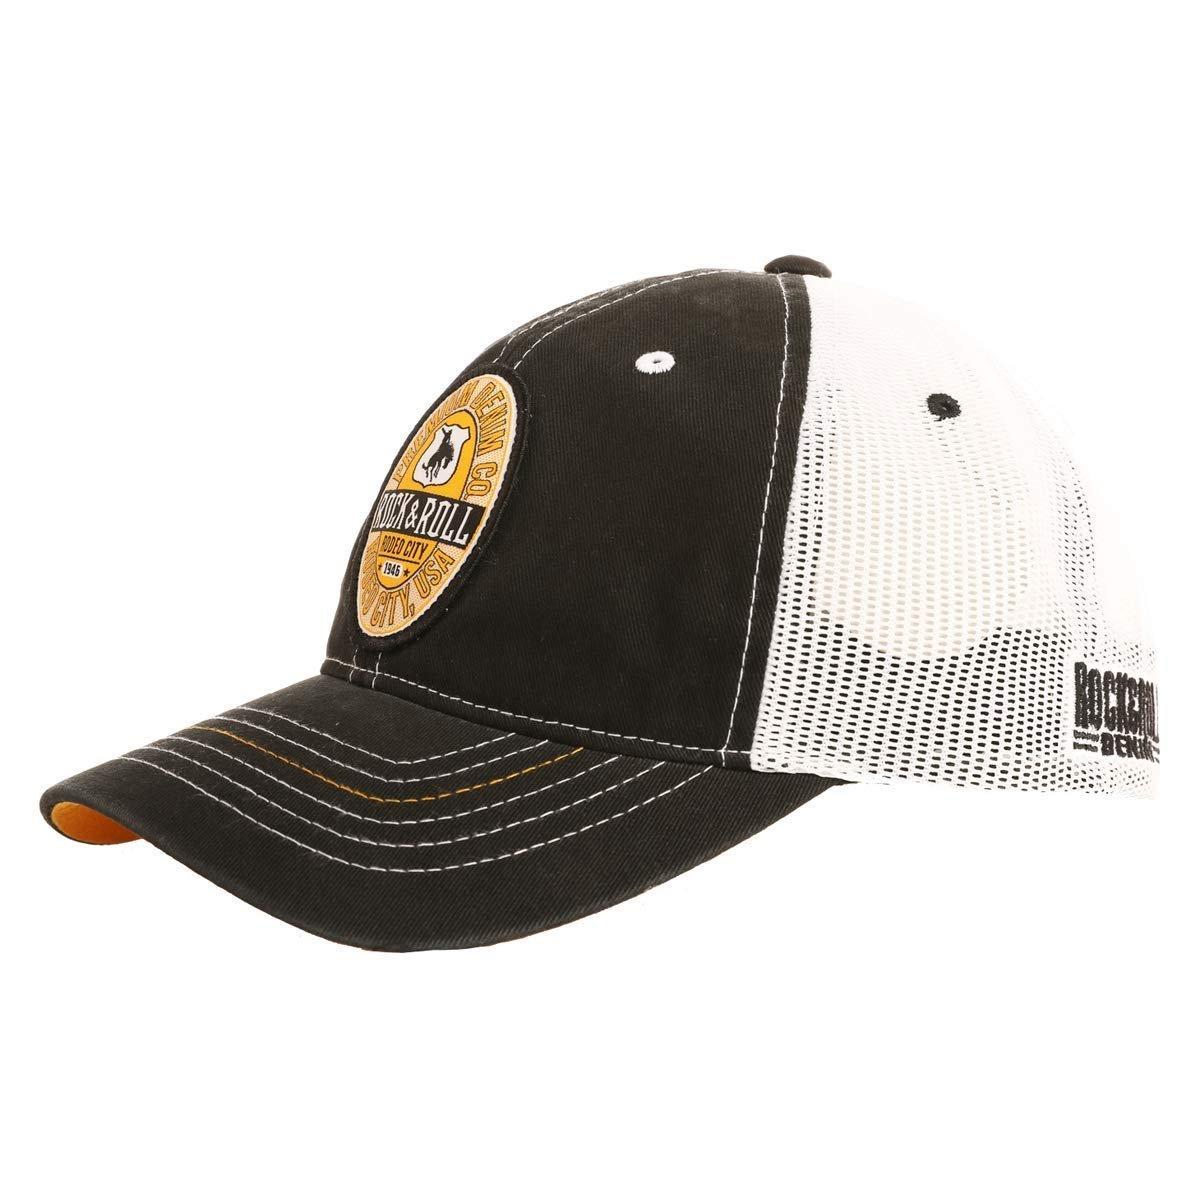 5edbf1bd289 Rock   Roll Denim Mesh Snapback Gold Contrast and Woven Patch Trucker Hat -.